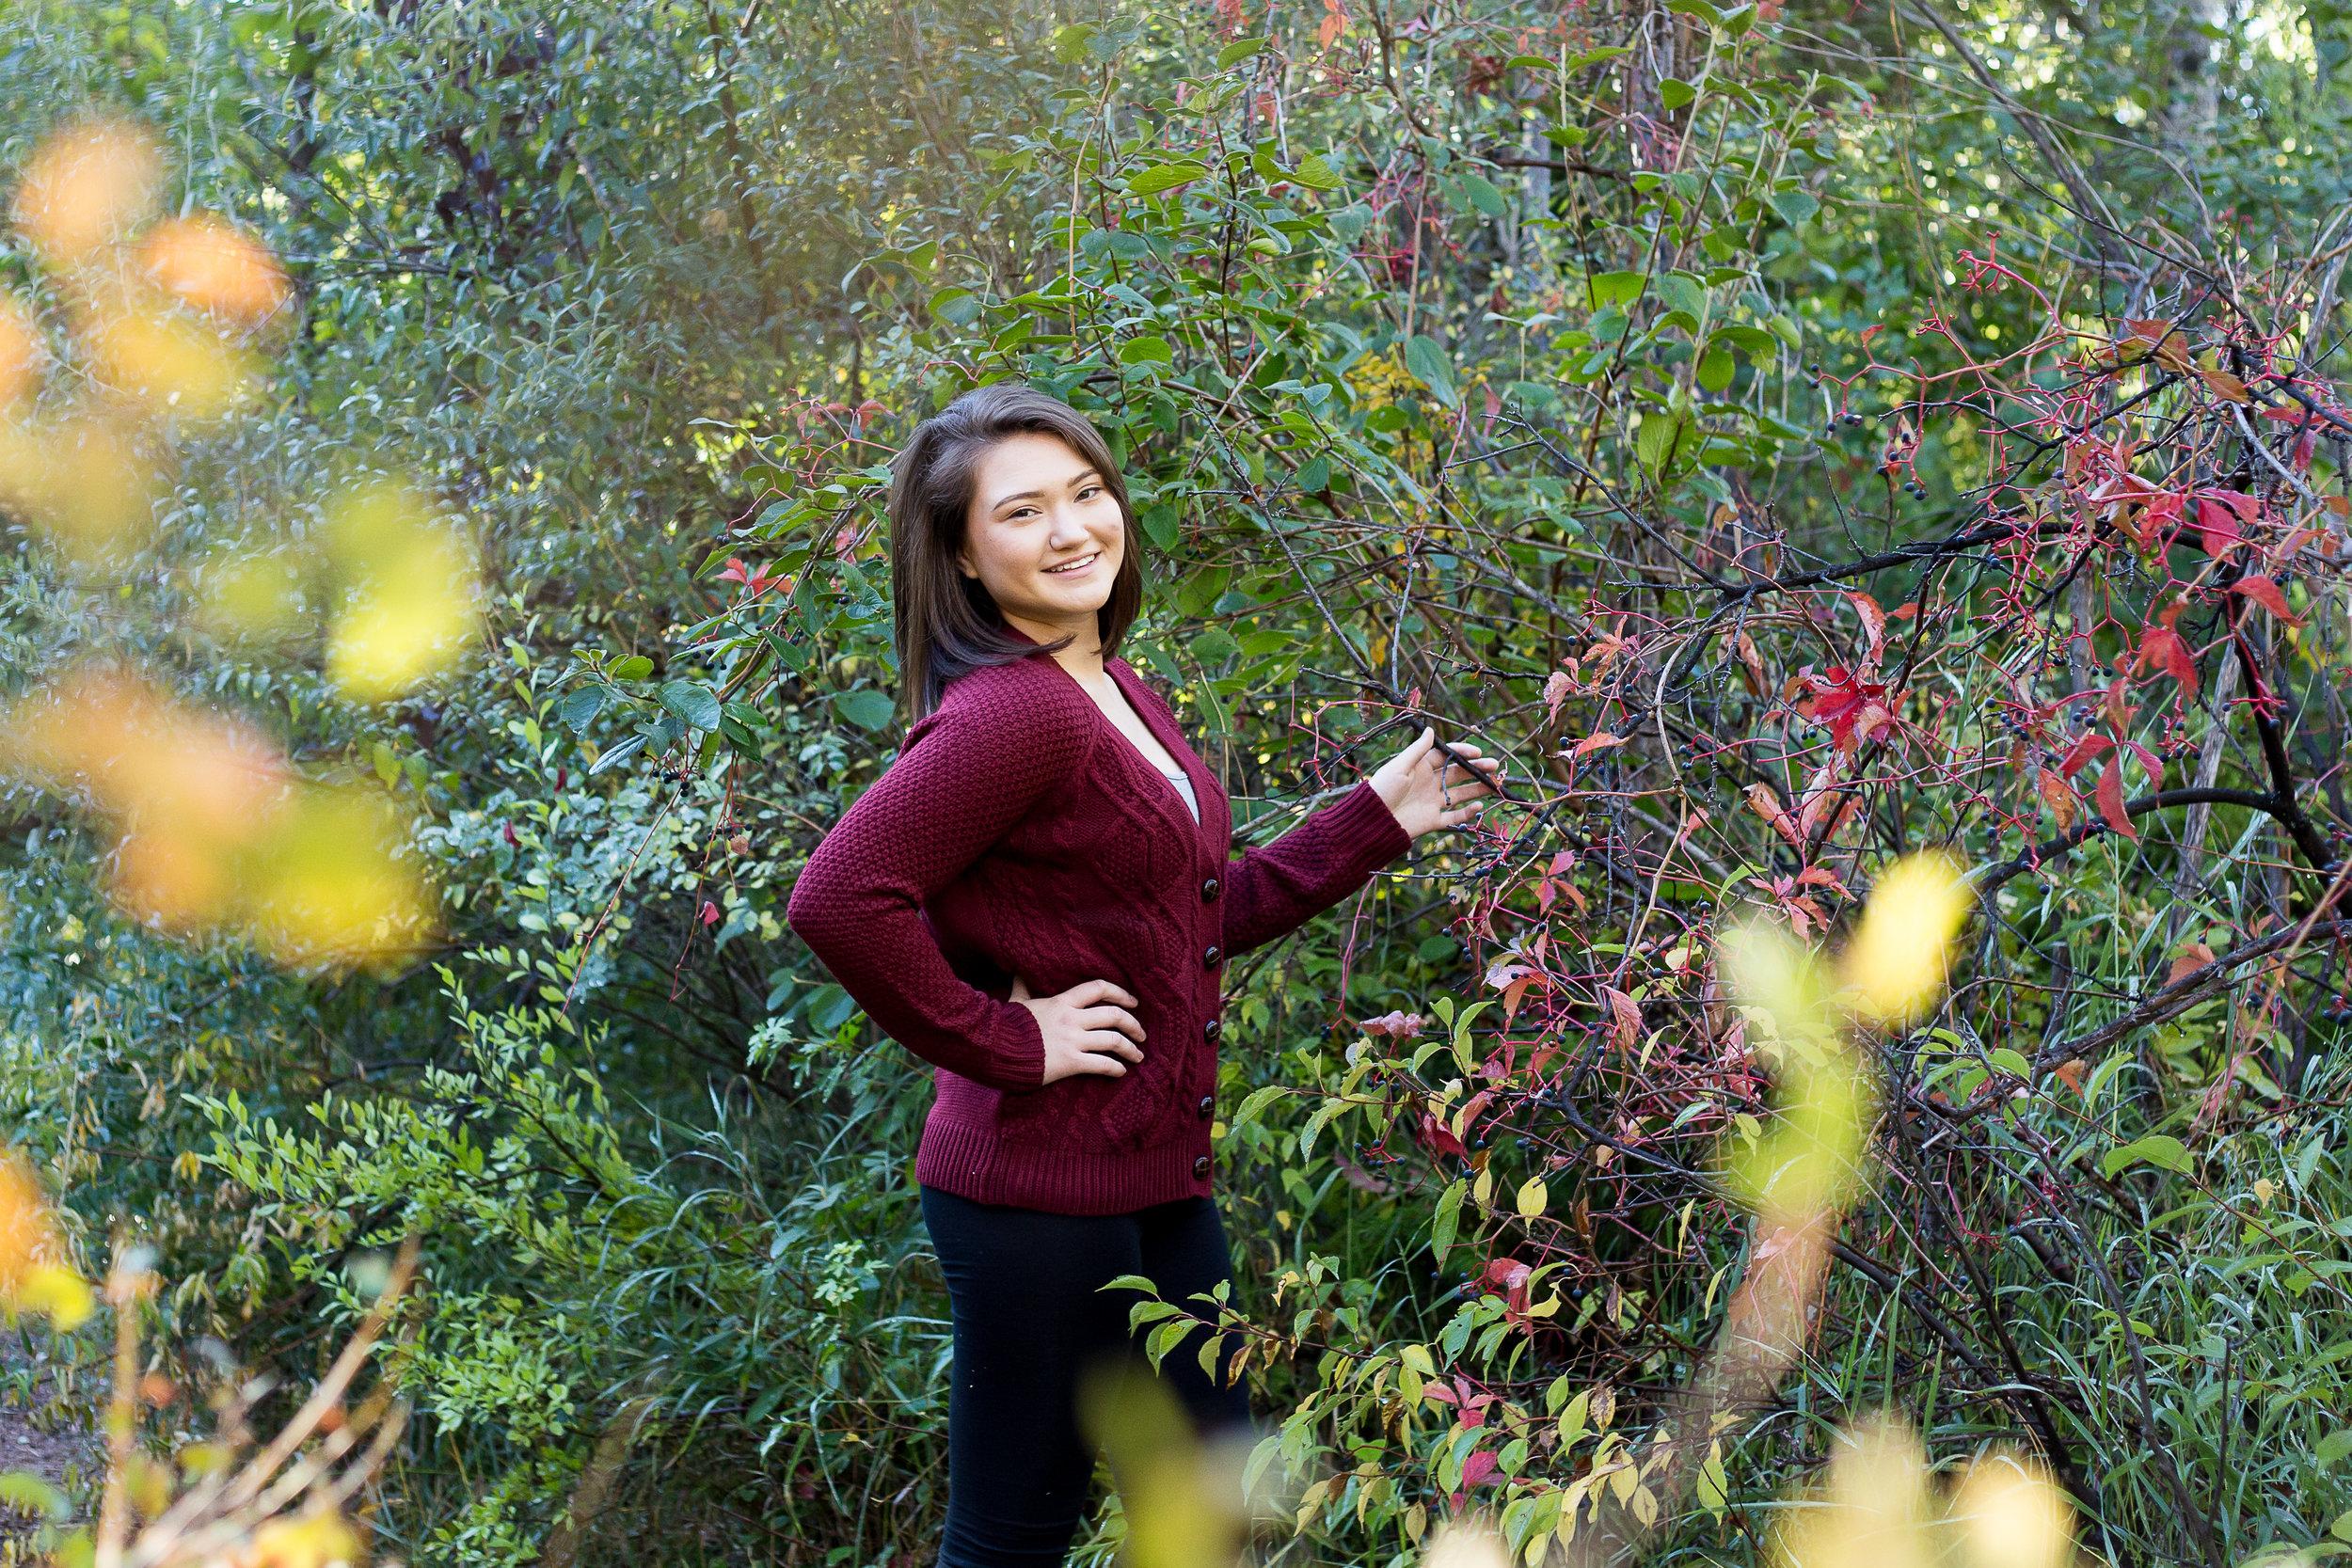 Victoria Colorado Springs Senior Photos